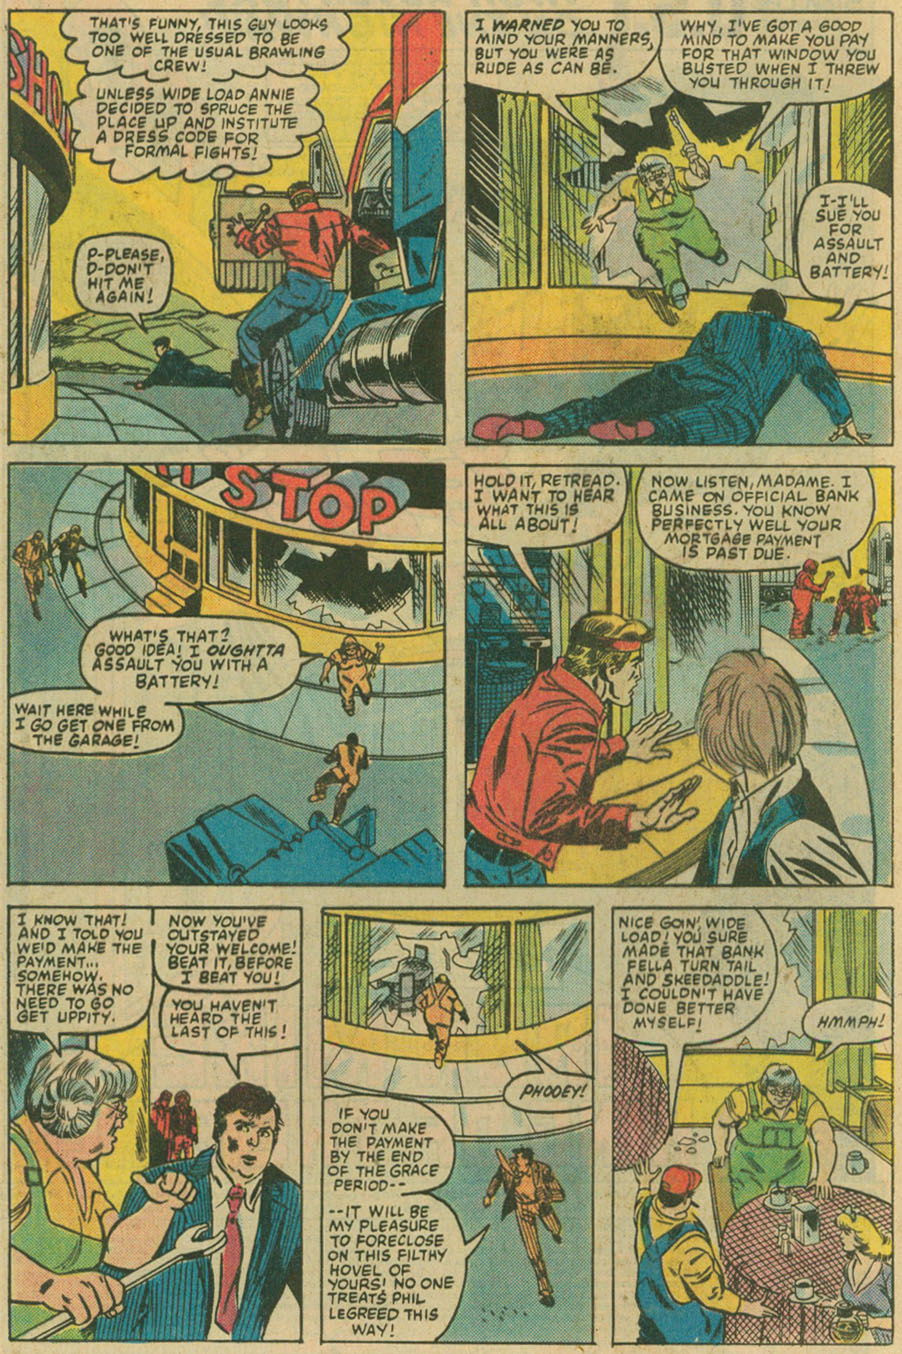 Read online U.S. 1 comic -  Issue #6 - 3